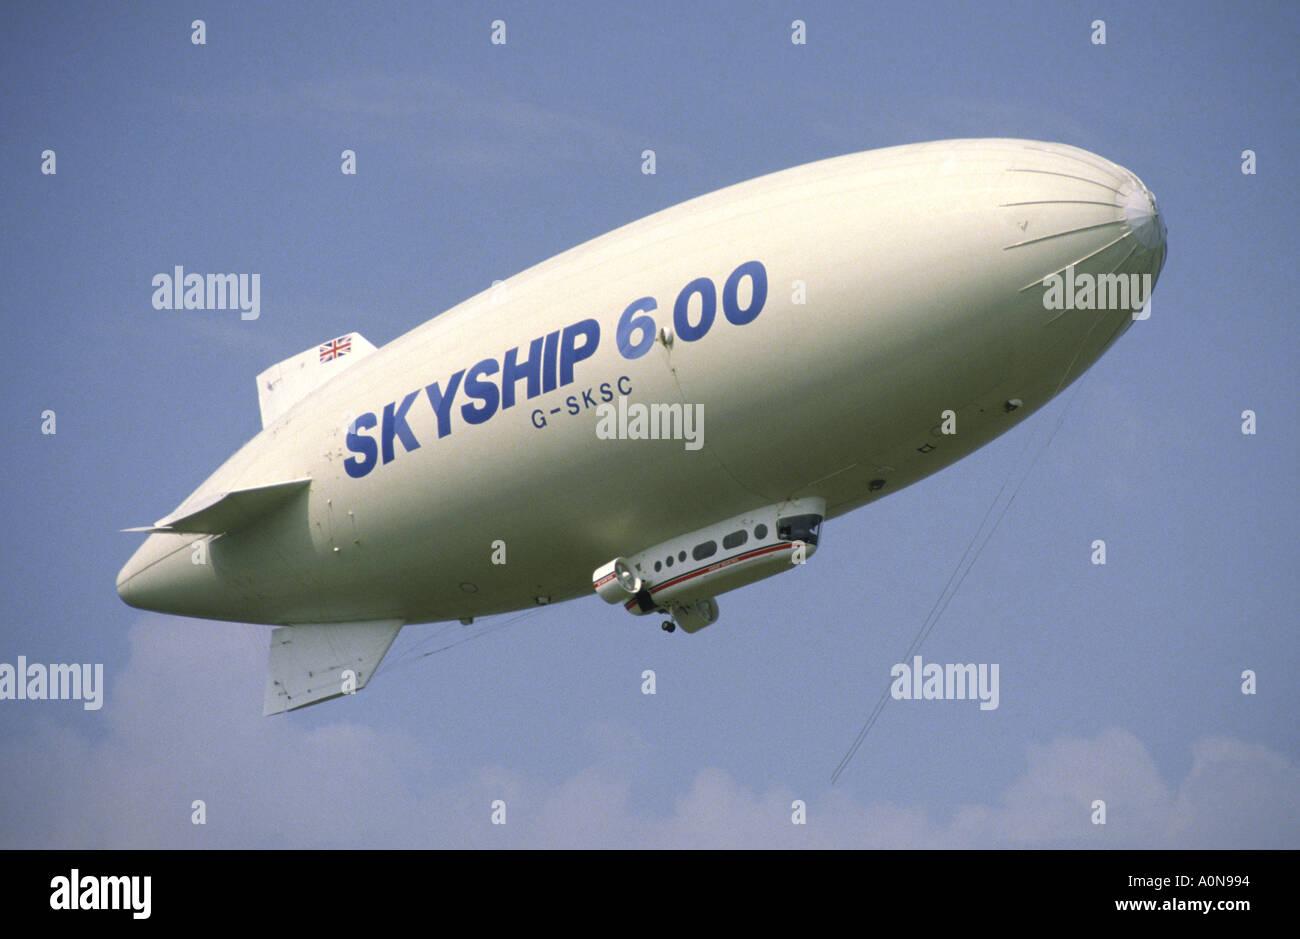 Skyship 600 Airship Farnborough Airshow Stock Photo